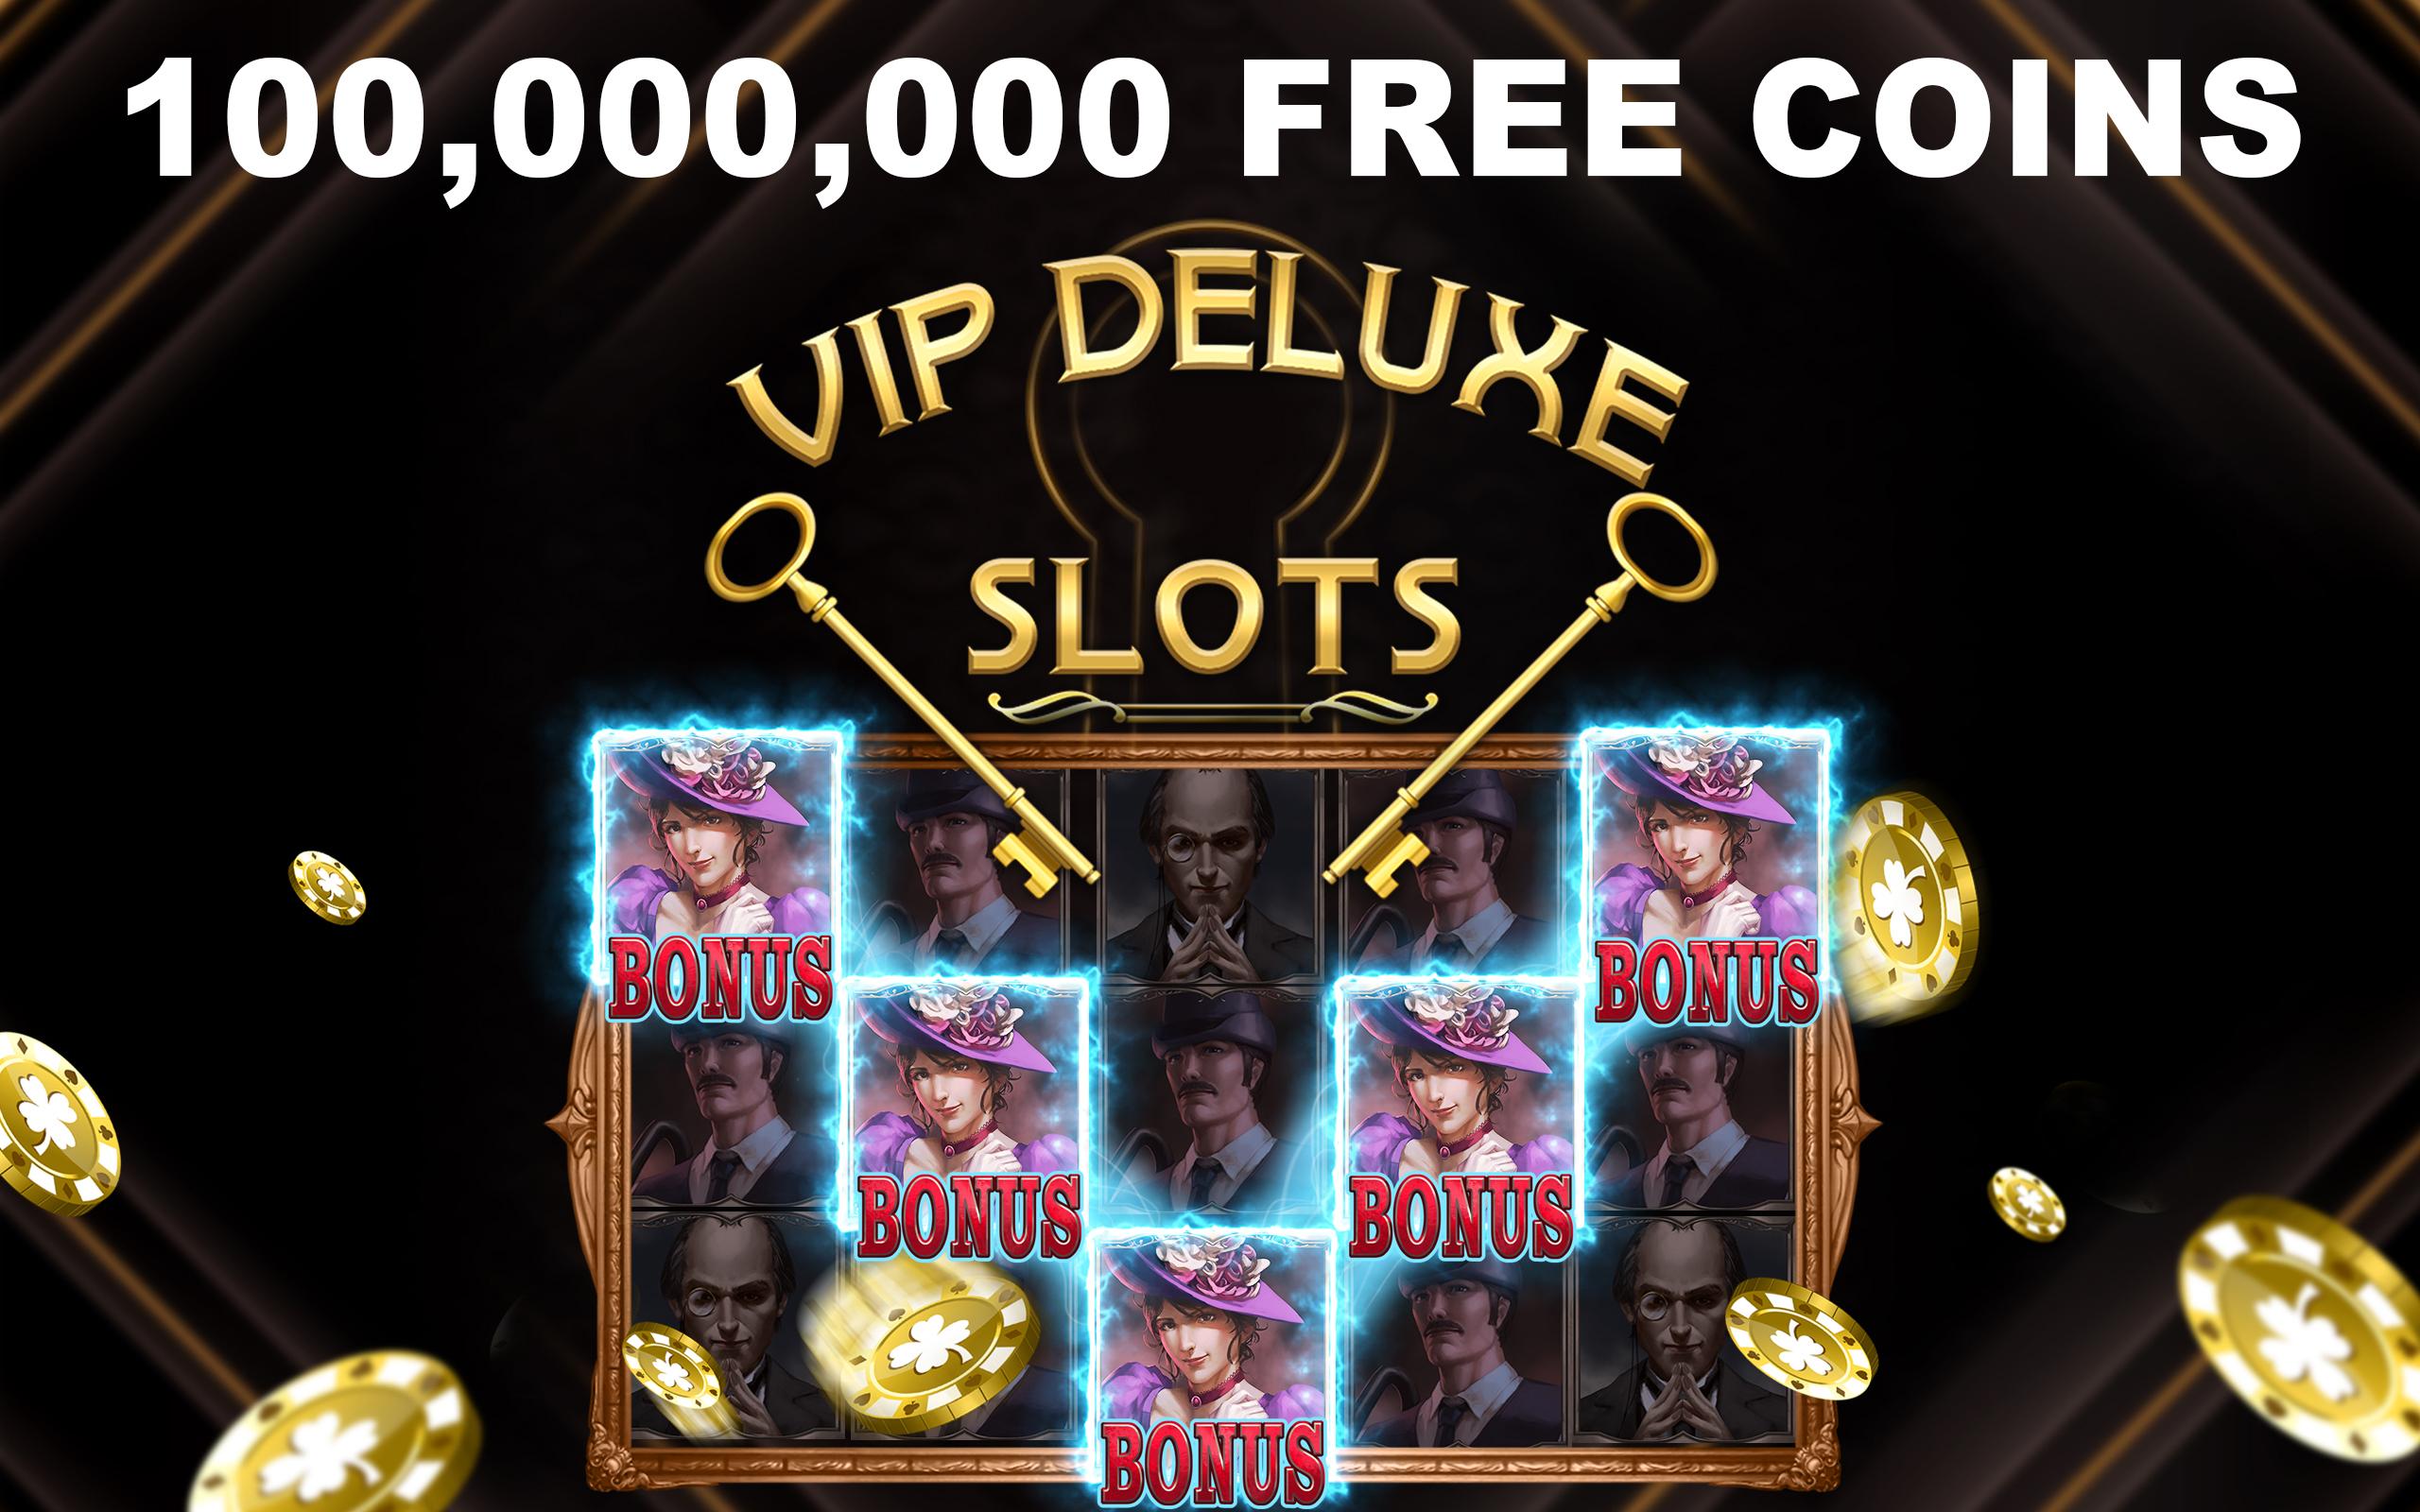 free online slots games deluxe slot